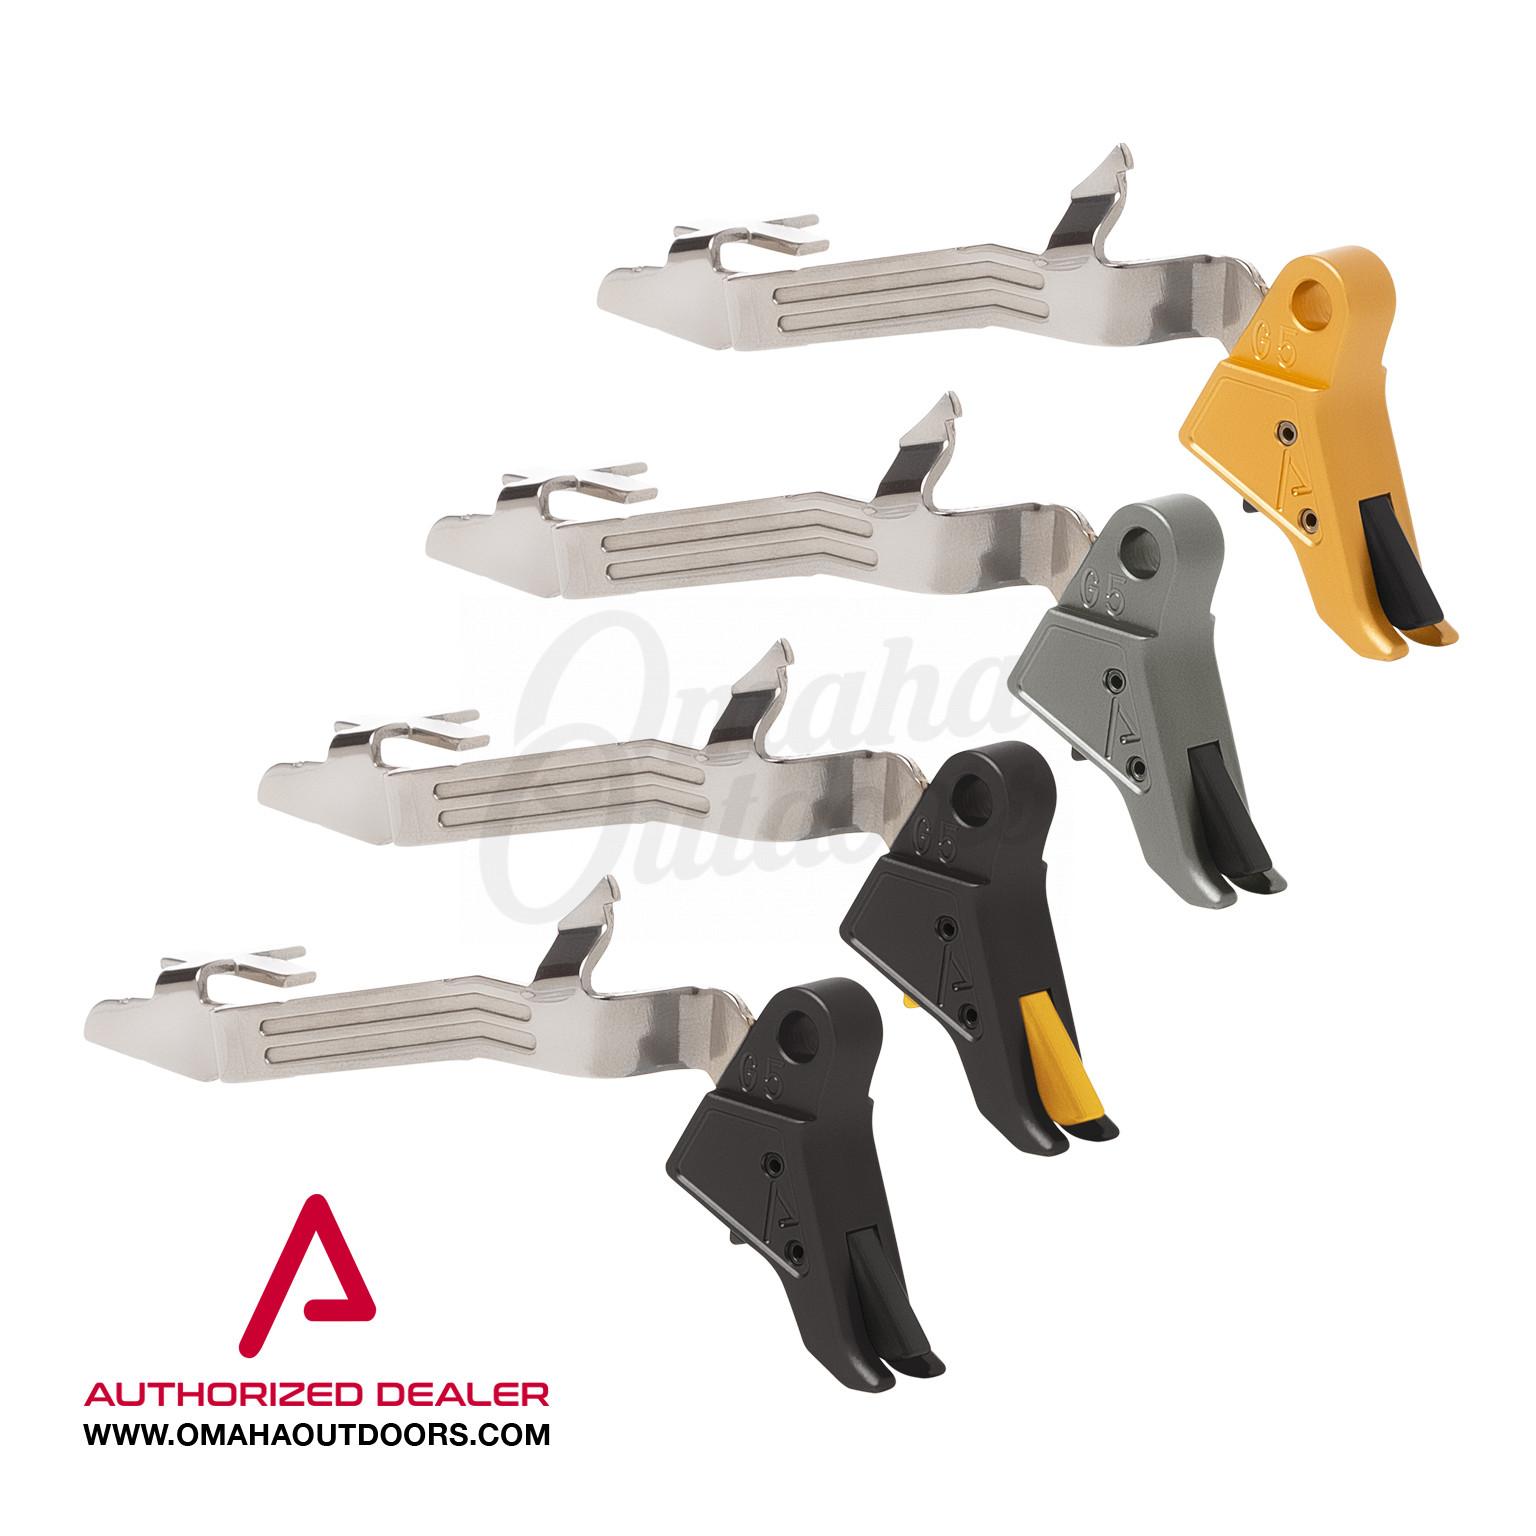 Agency Arms Glock 17 19 26 34 Gen 5 Trigger